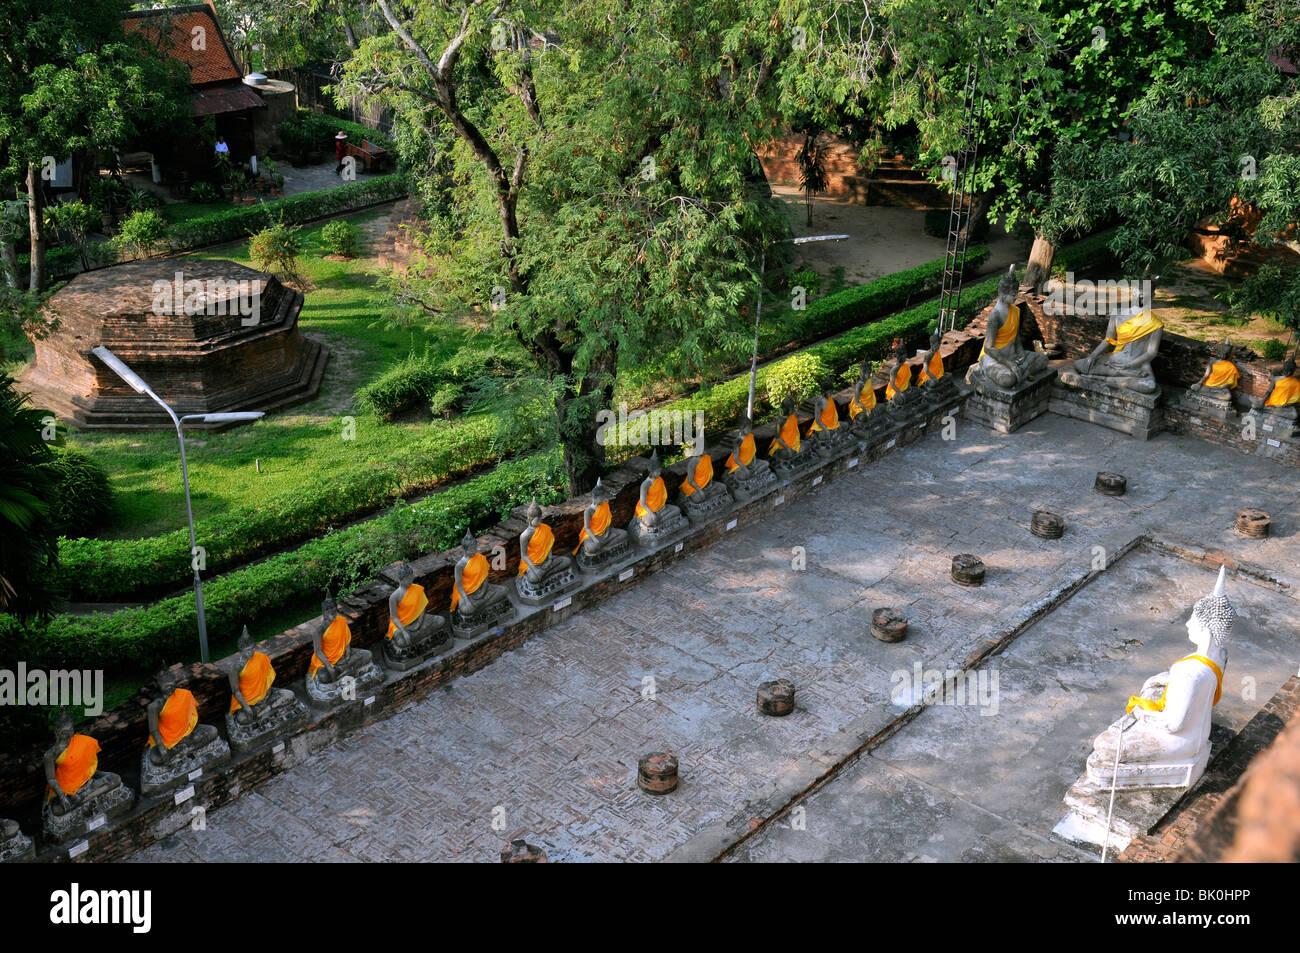 Le Wat Yai Chai Mongkhon Thailande - Stock Image